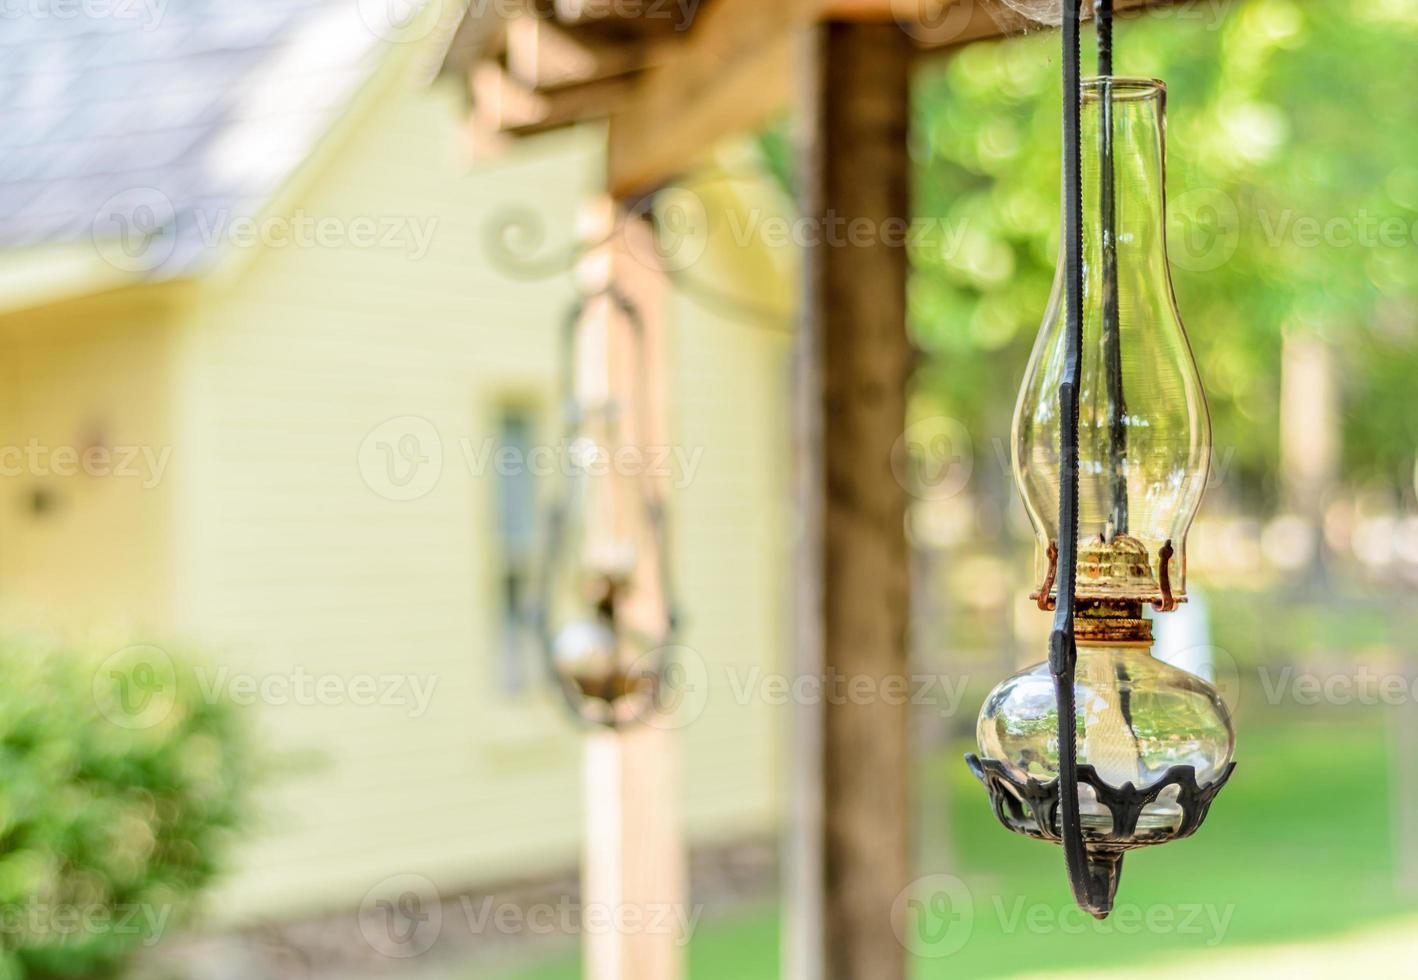 Oil Lamp in the Porch photo